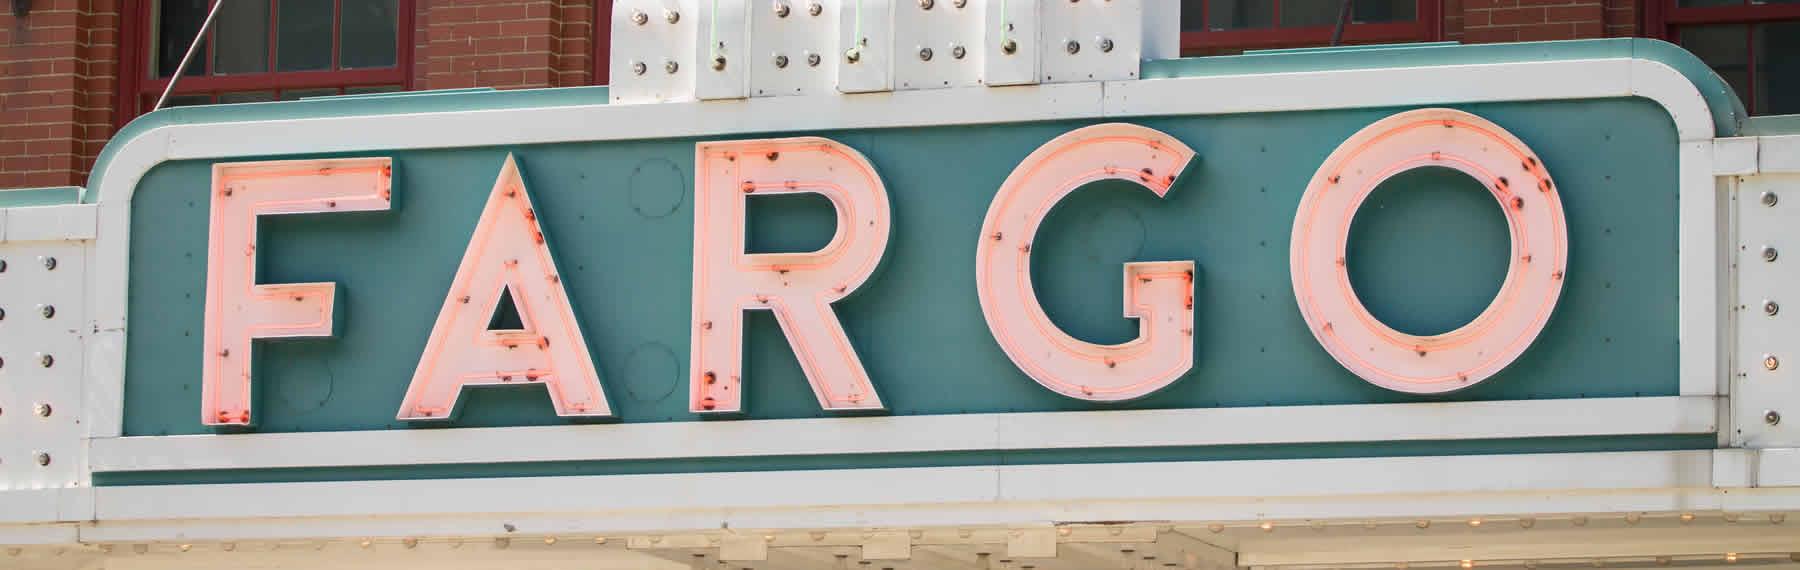 Simple Website Creations provides digital marketing services in the Fargo-Moorhead region.